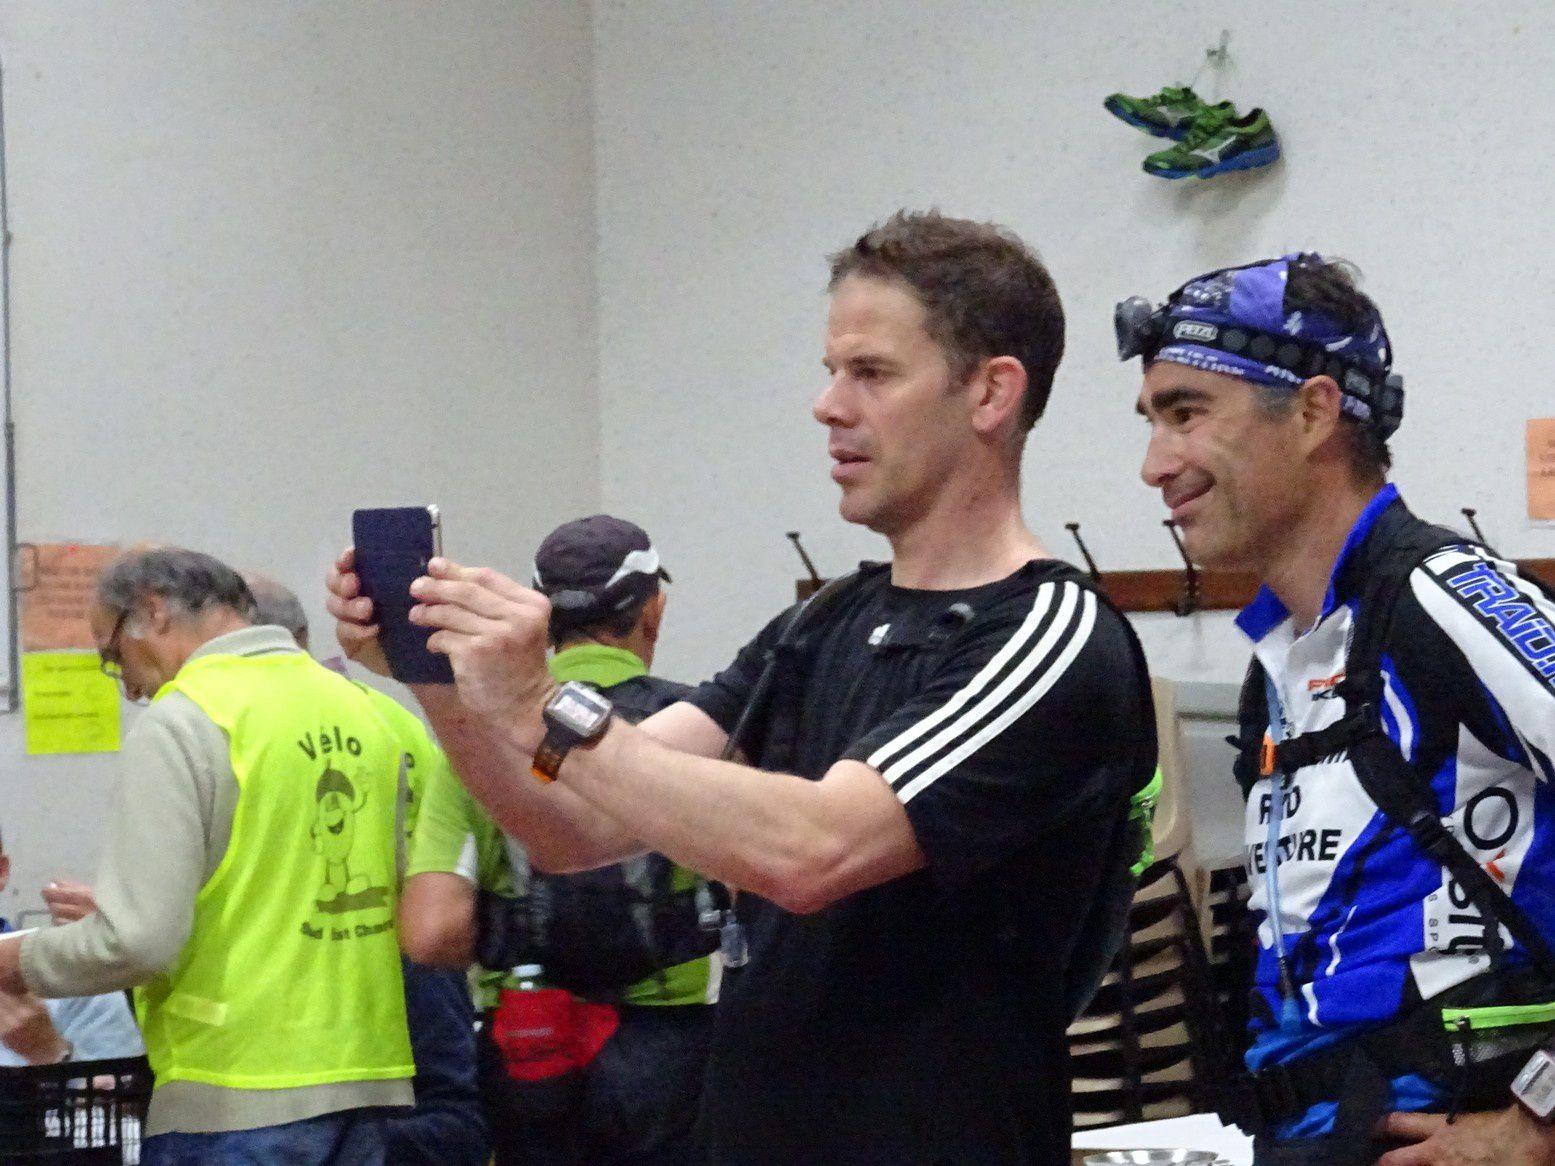 DIRAC CO 2017 les Photos